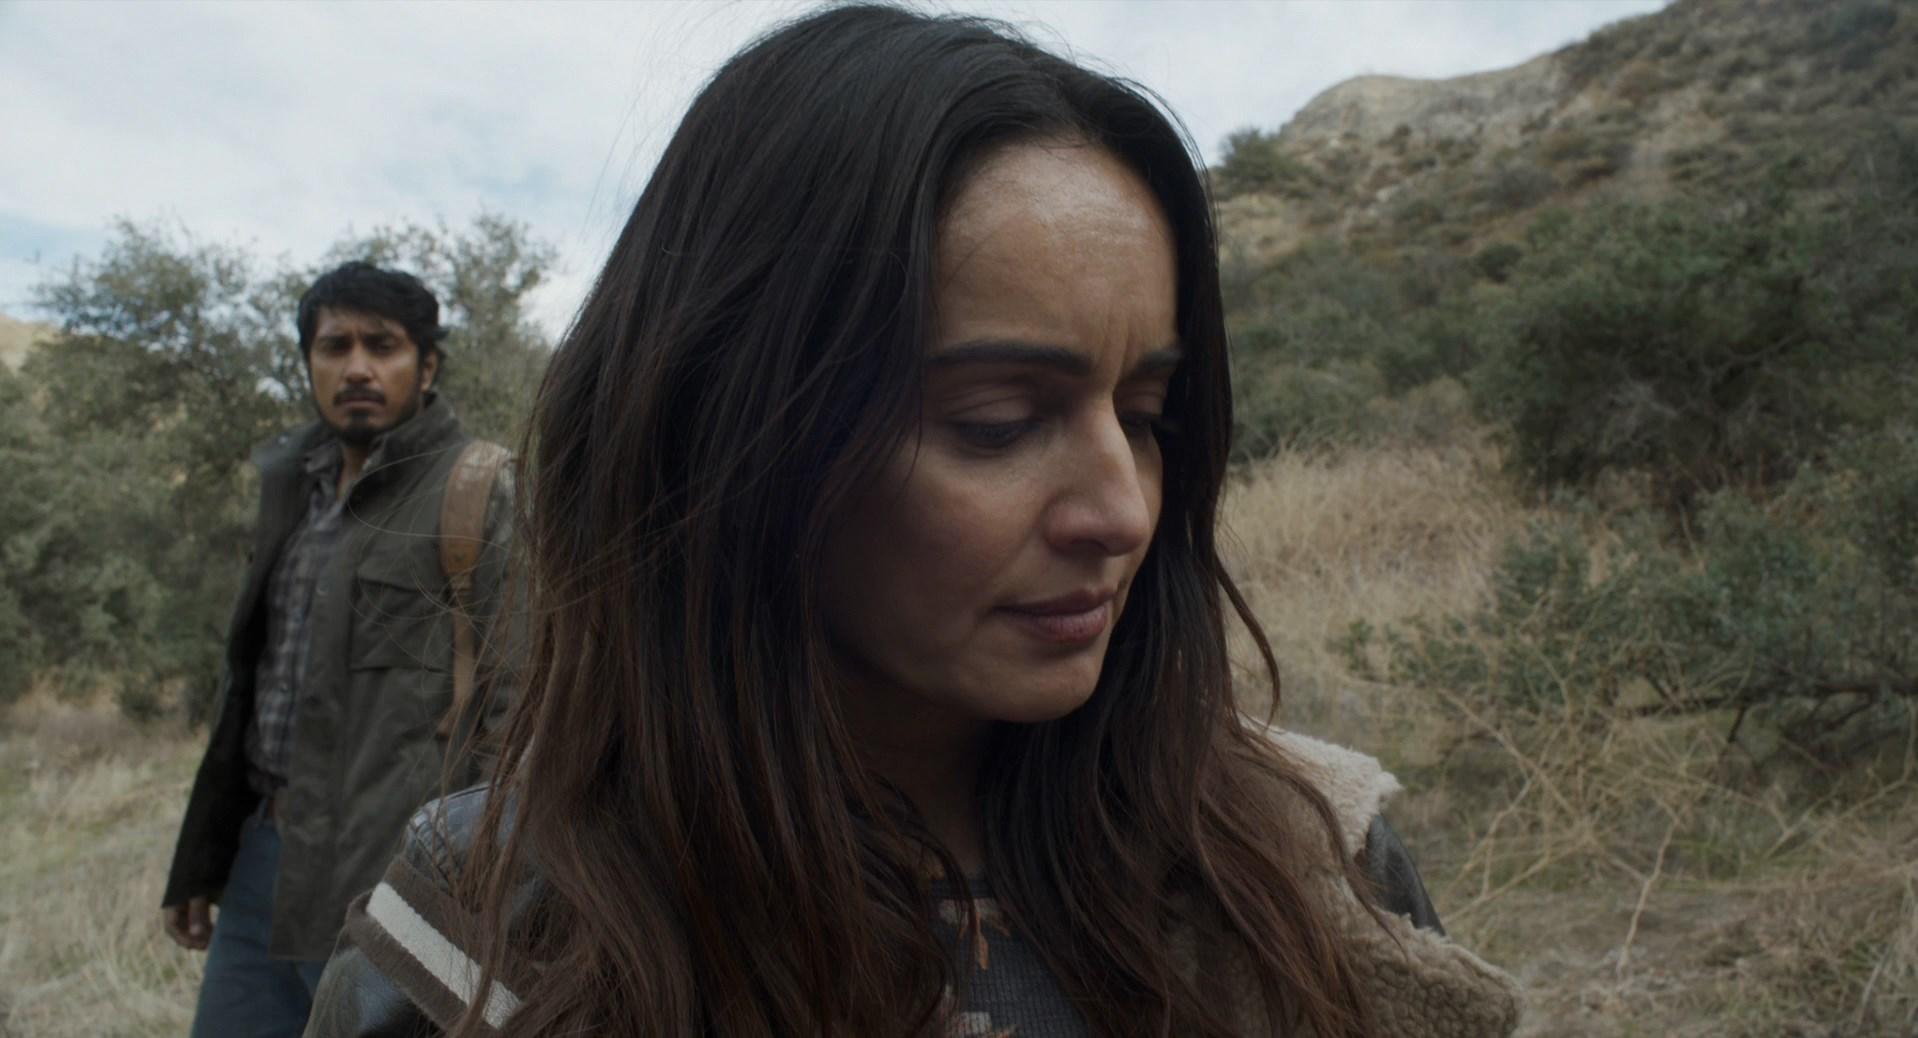 La purga por siempre (2021) 1080p WEB-DL Latino